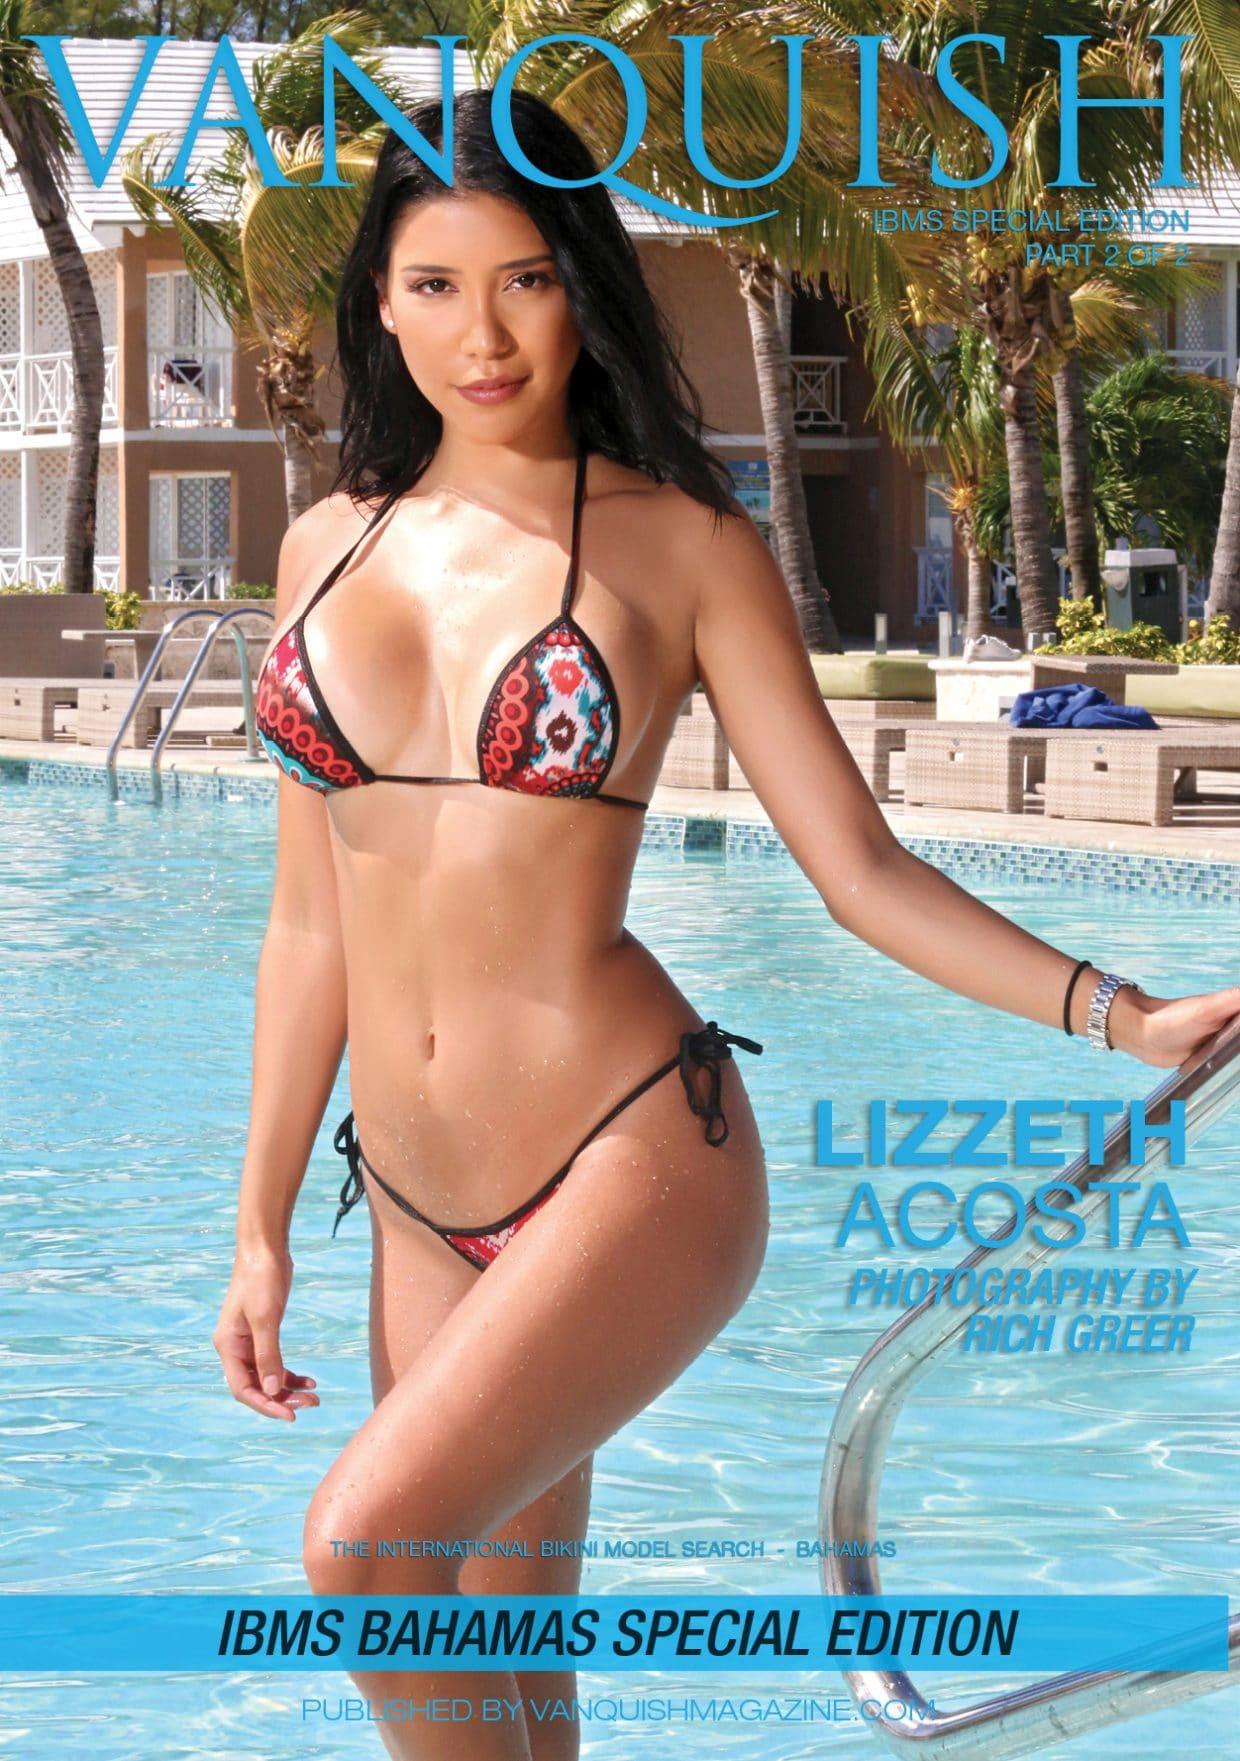 vanquish magazine ibms bahamas part 2   lizzeth acosta